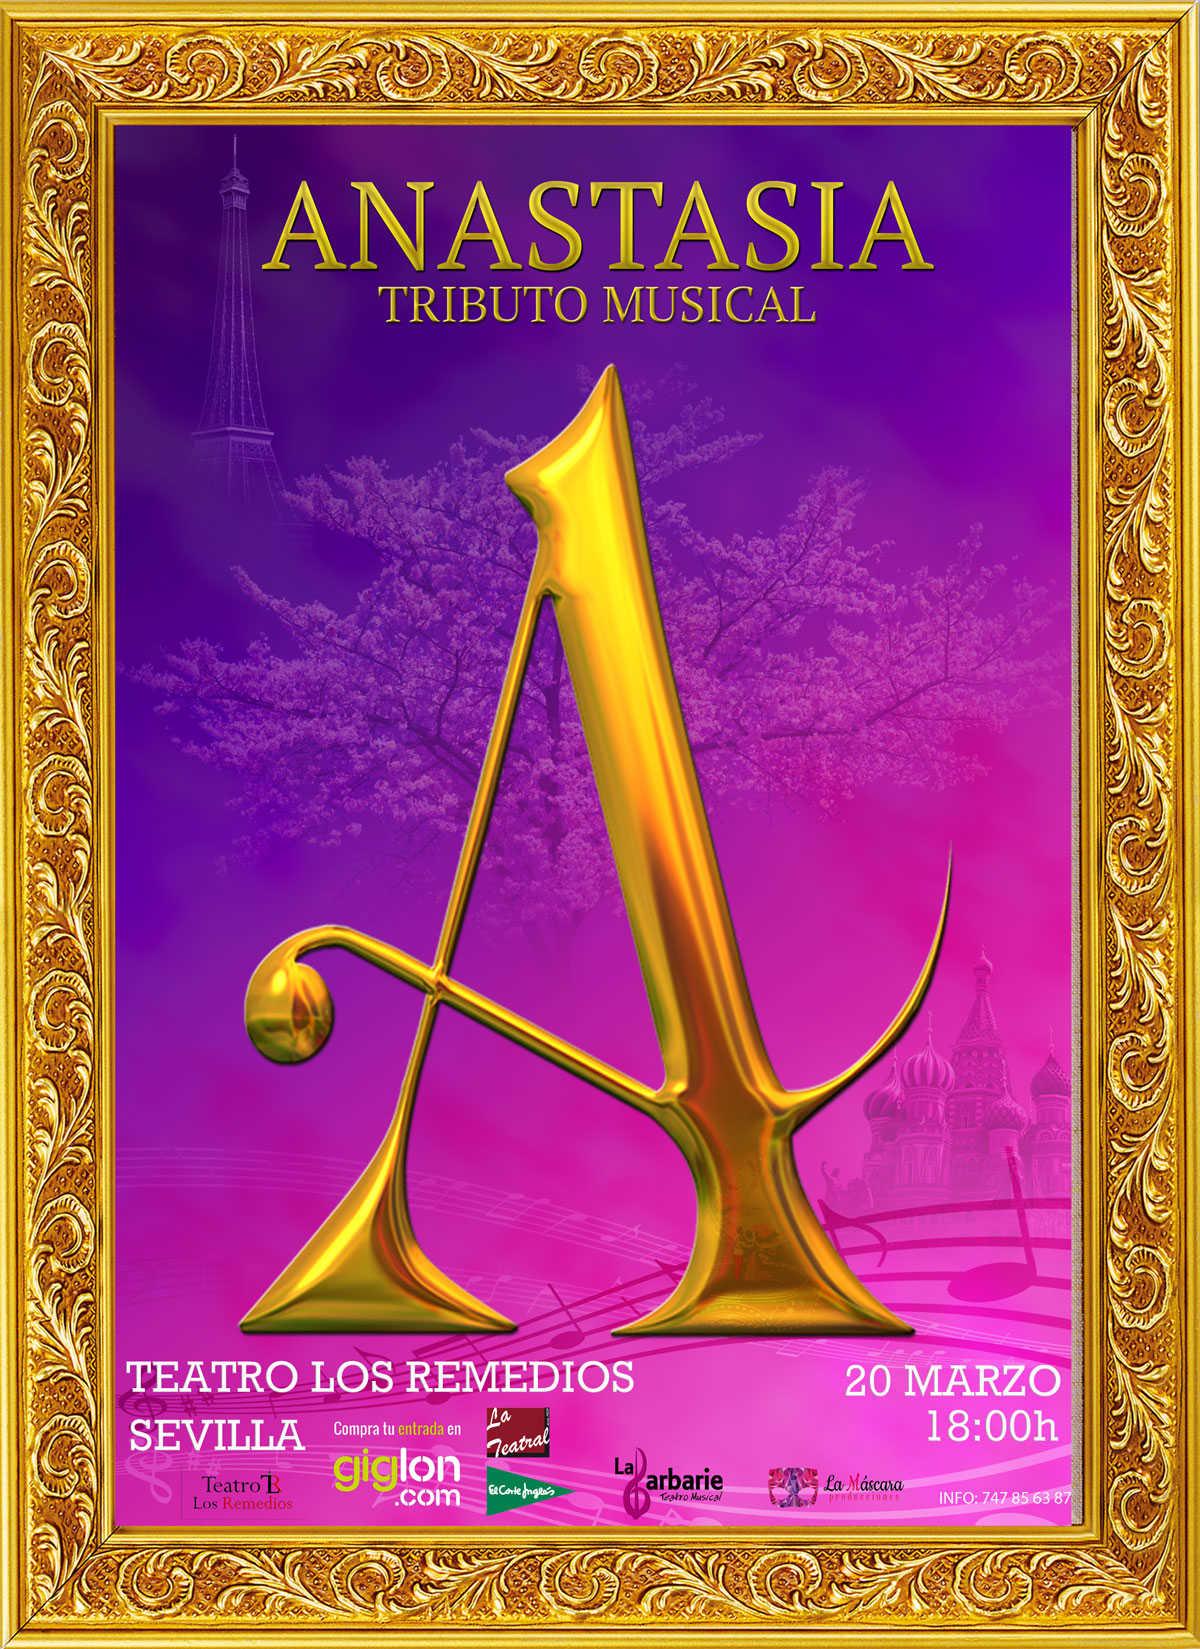 Anastasia. Tributo musical